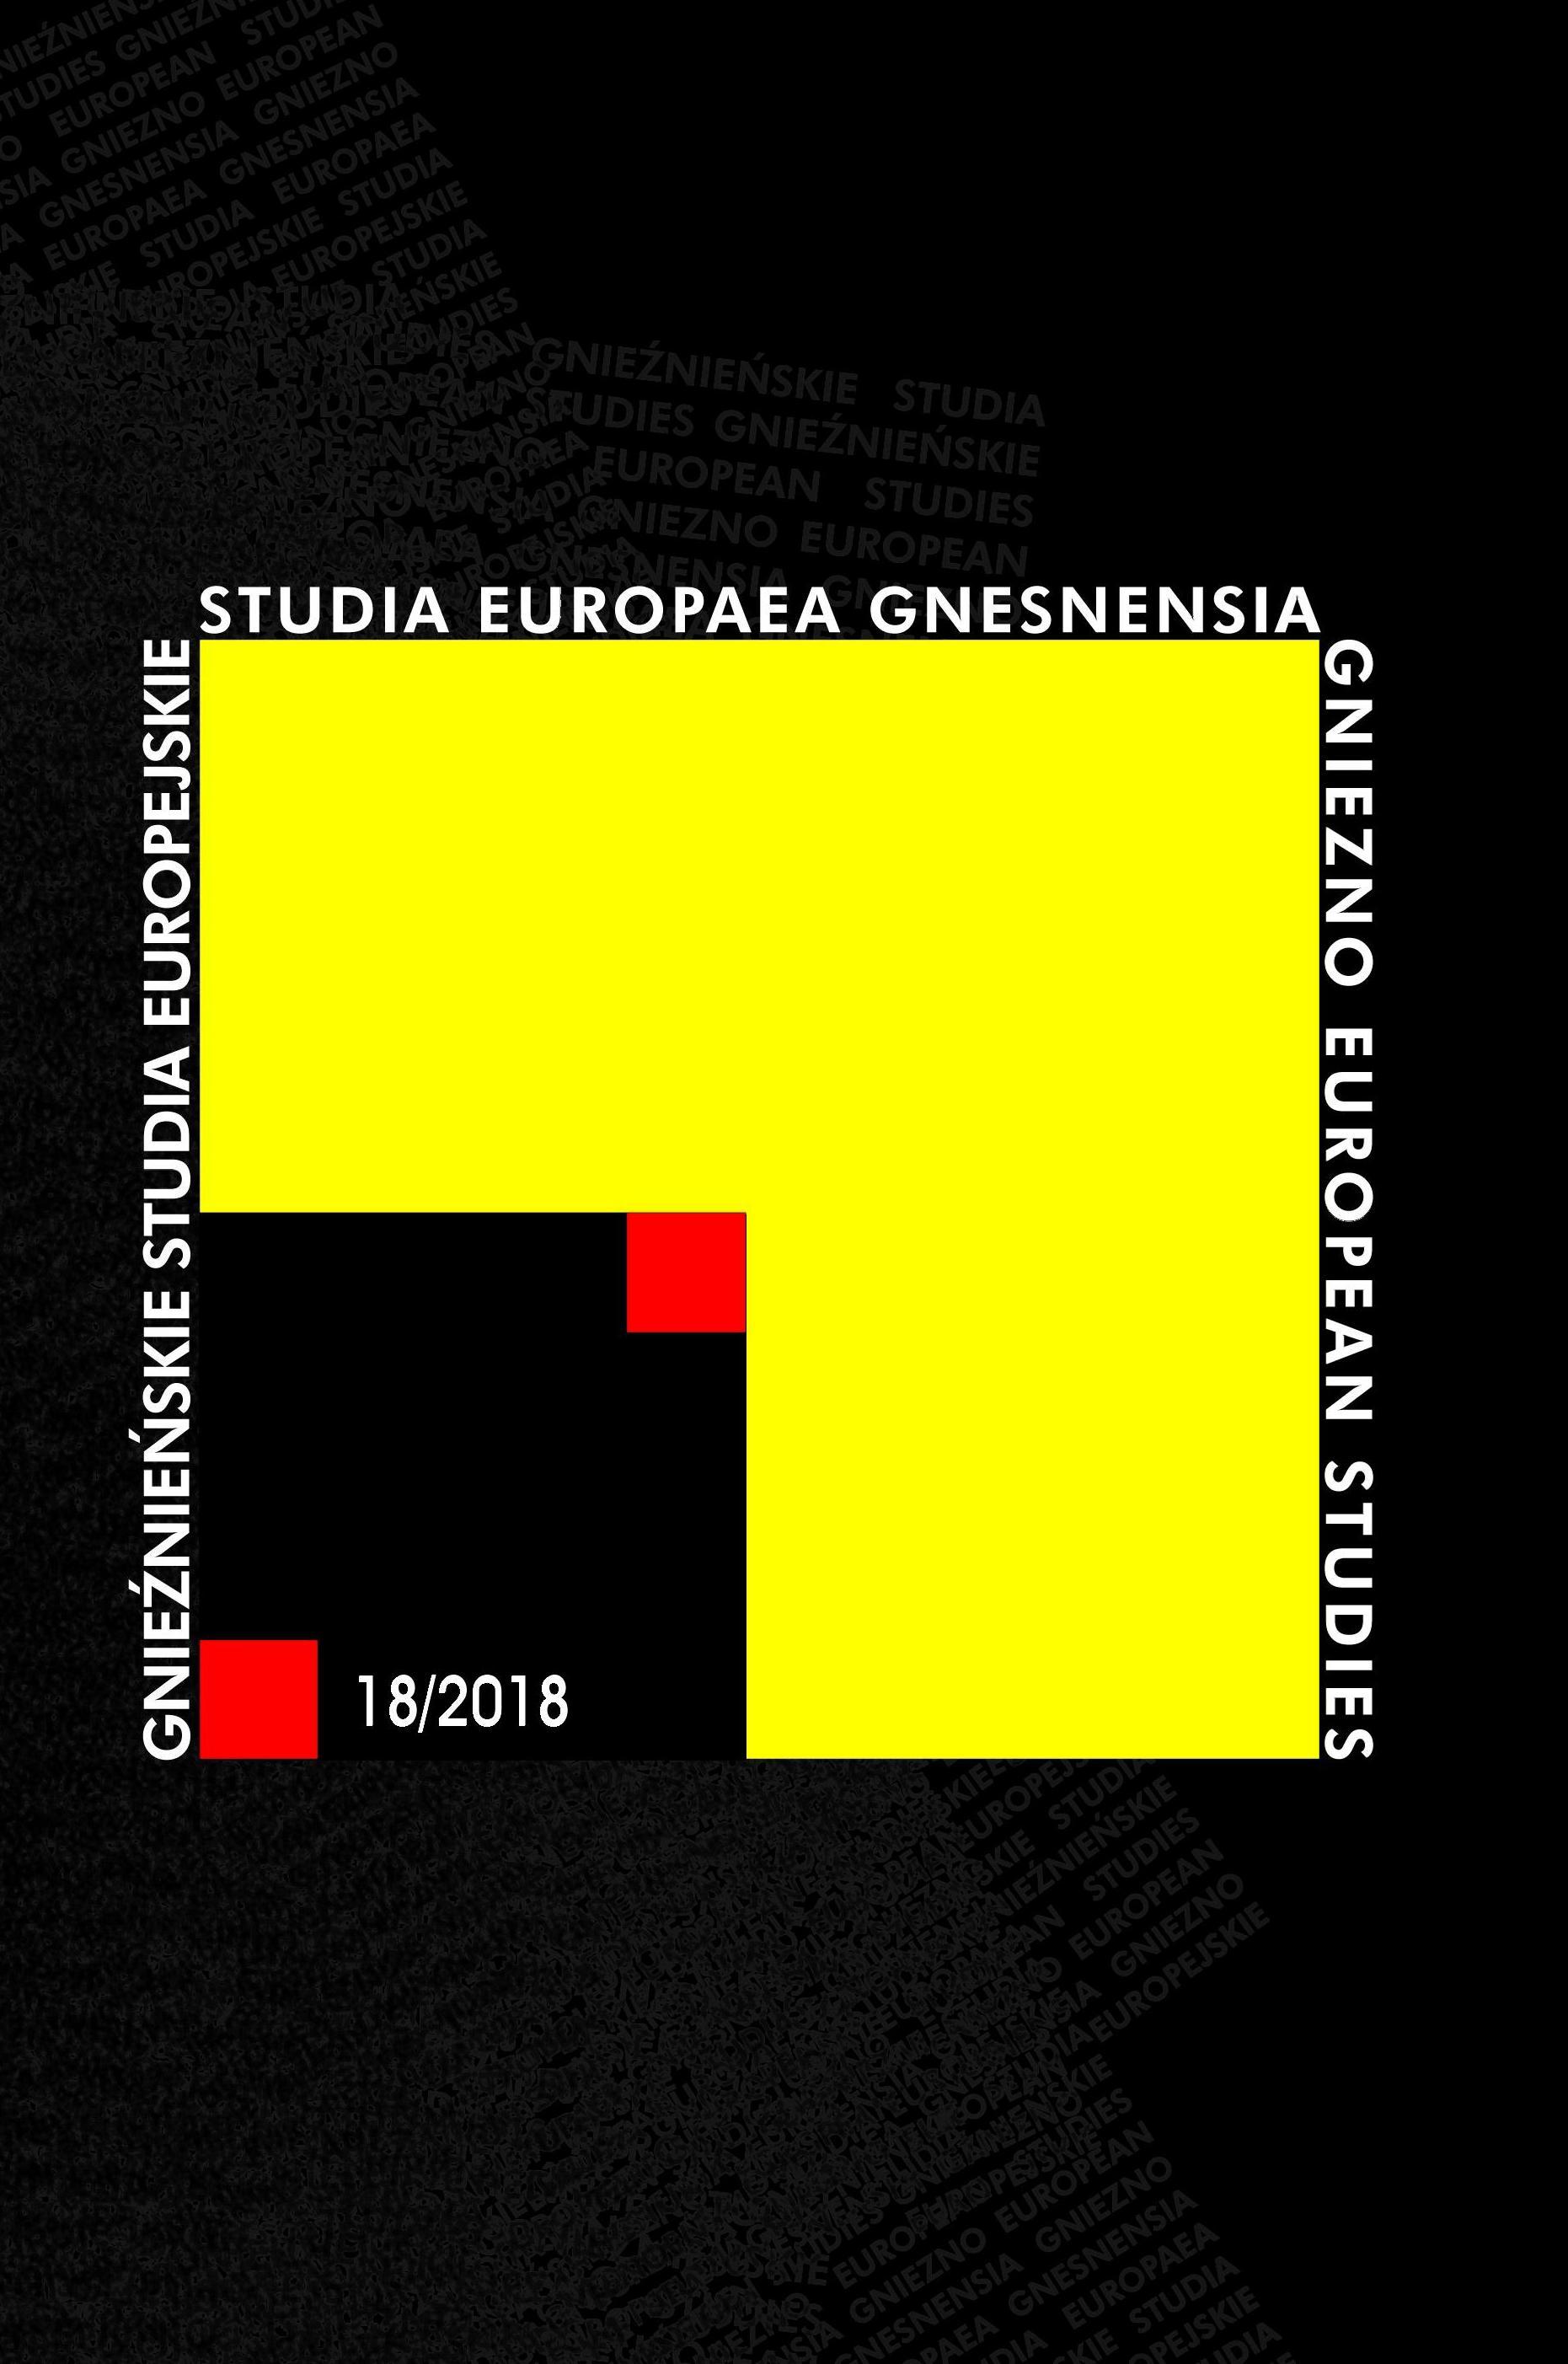 Nowy, osiemnasty numer Studia Europaea Gnesnensia